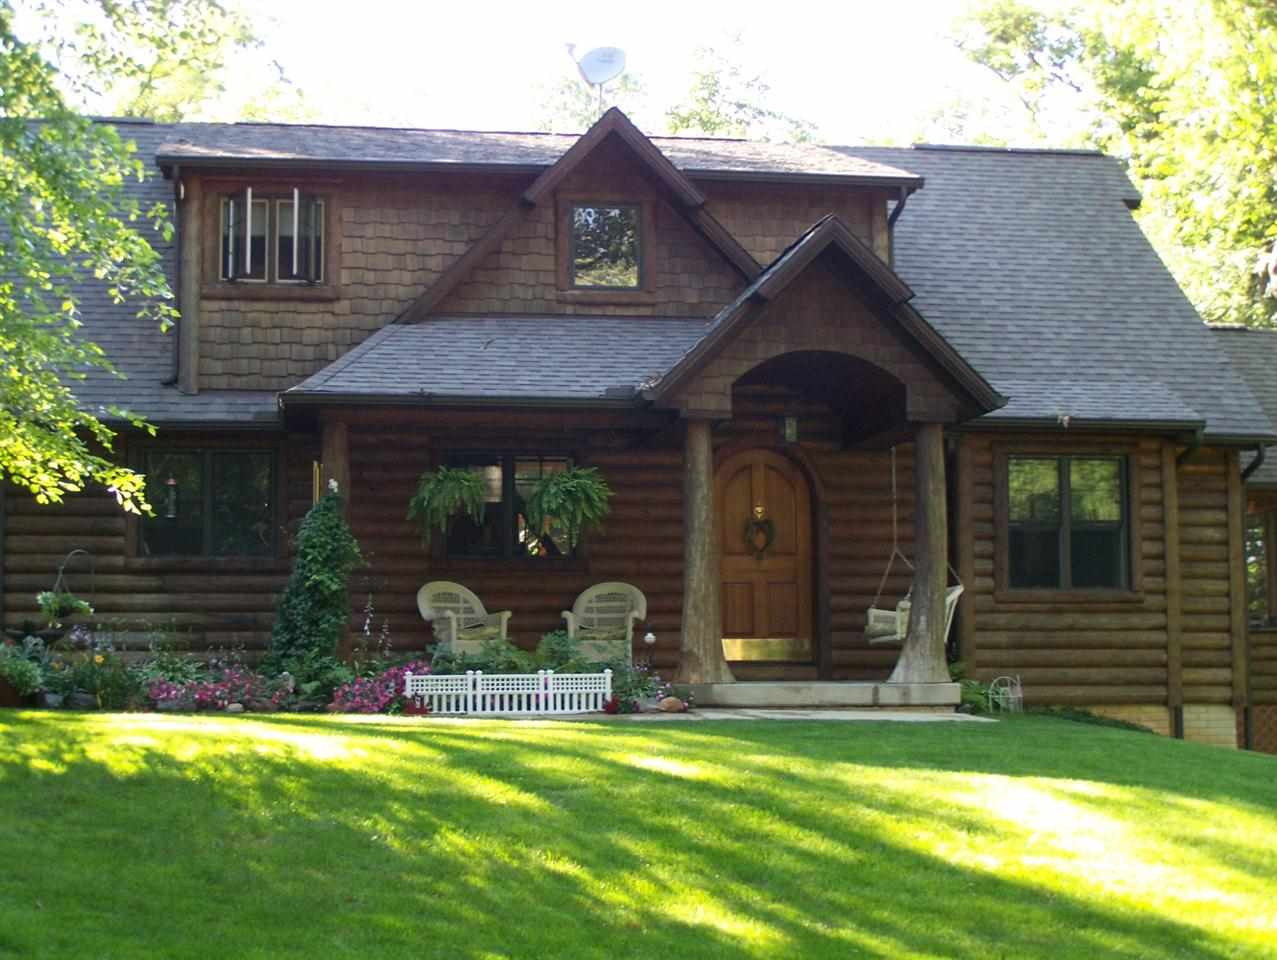 Real Estate for Sale, ListingId: 30795710, Orion,IL61273